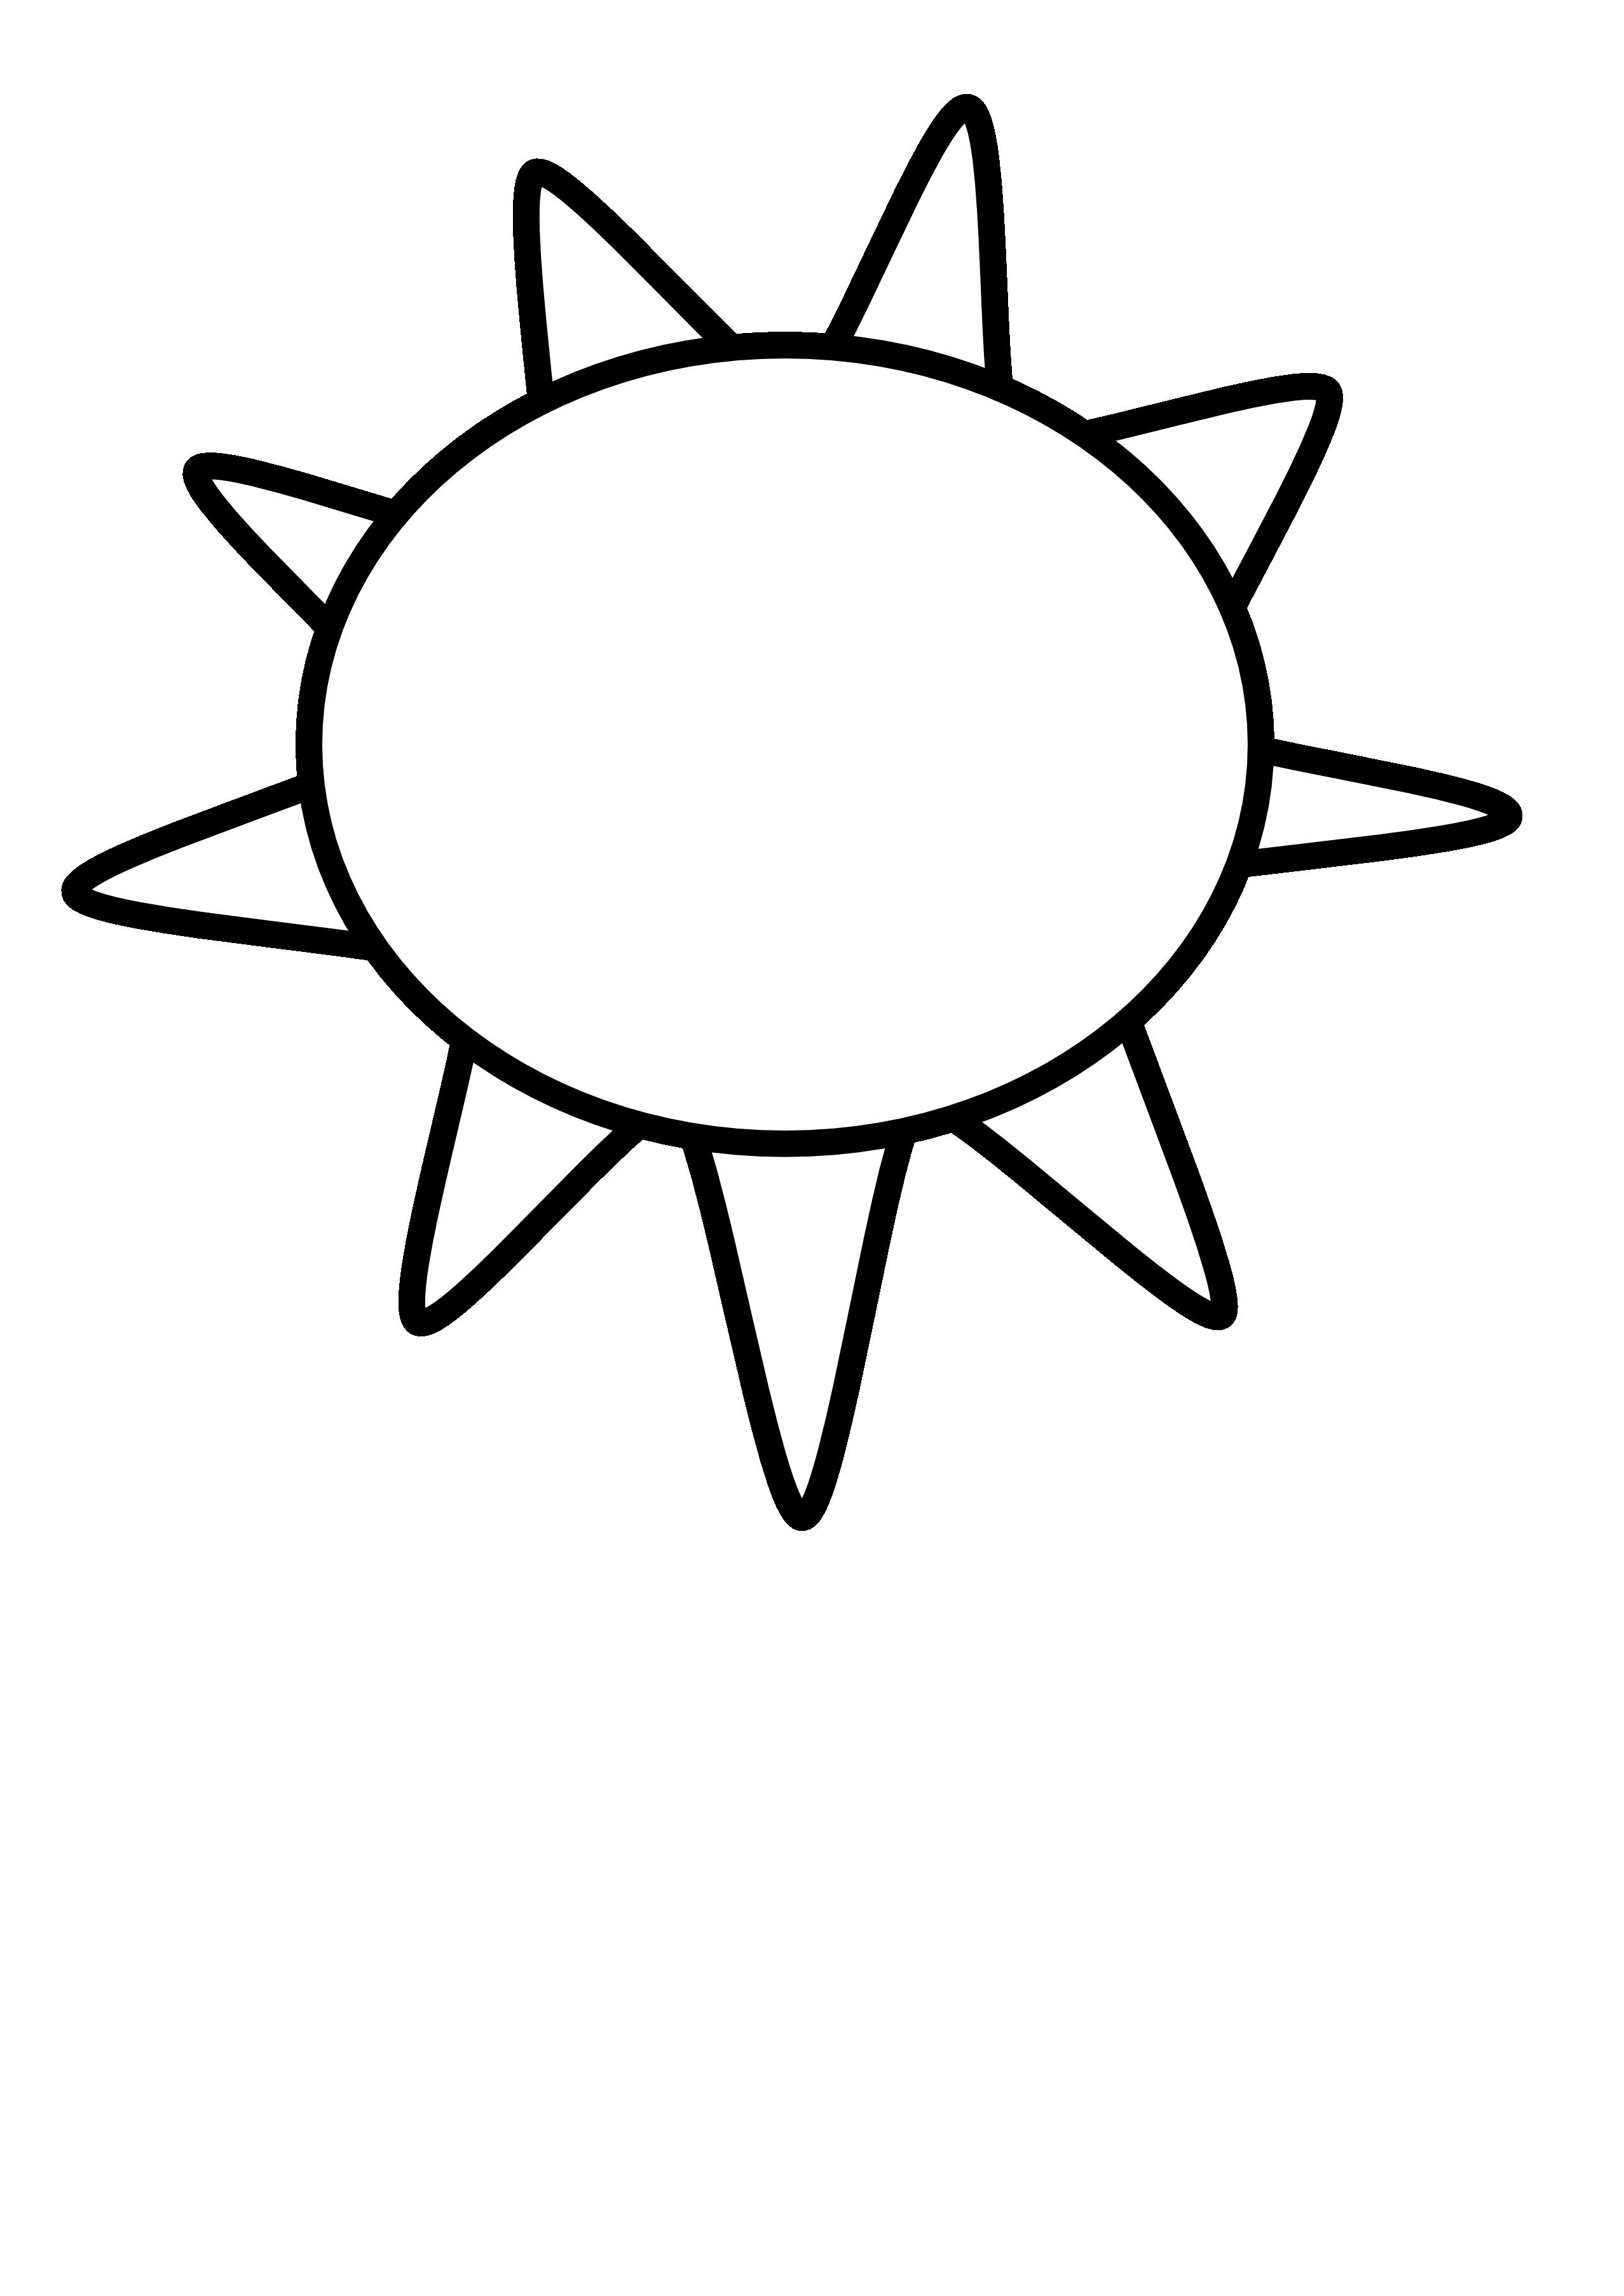 2555x3613 Sun Black And White Clipart